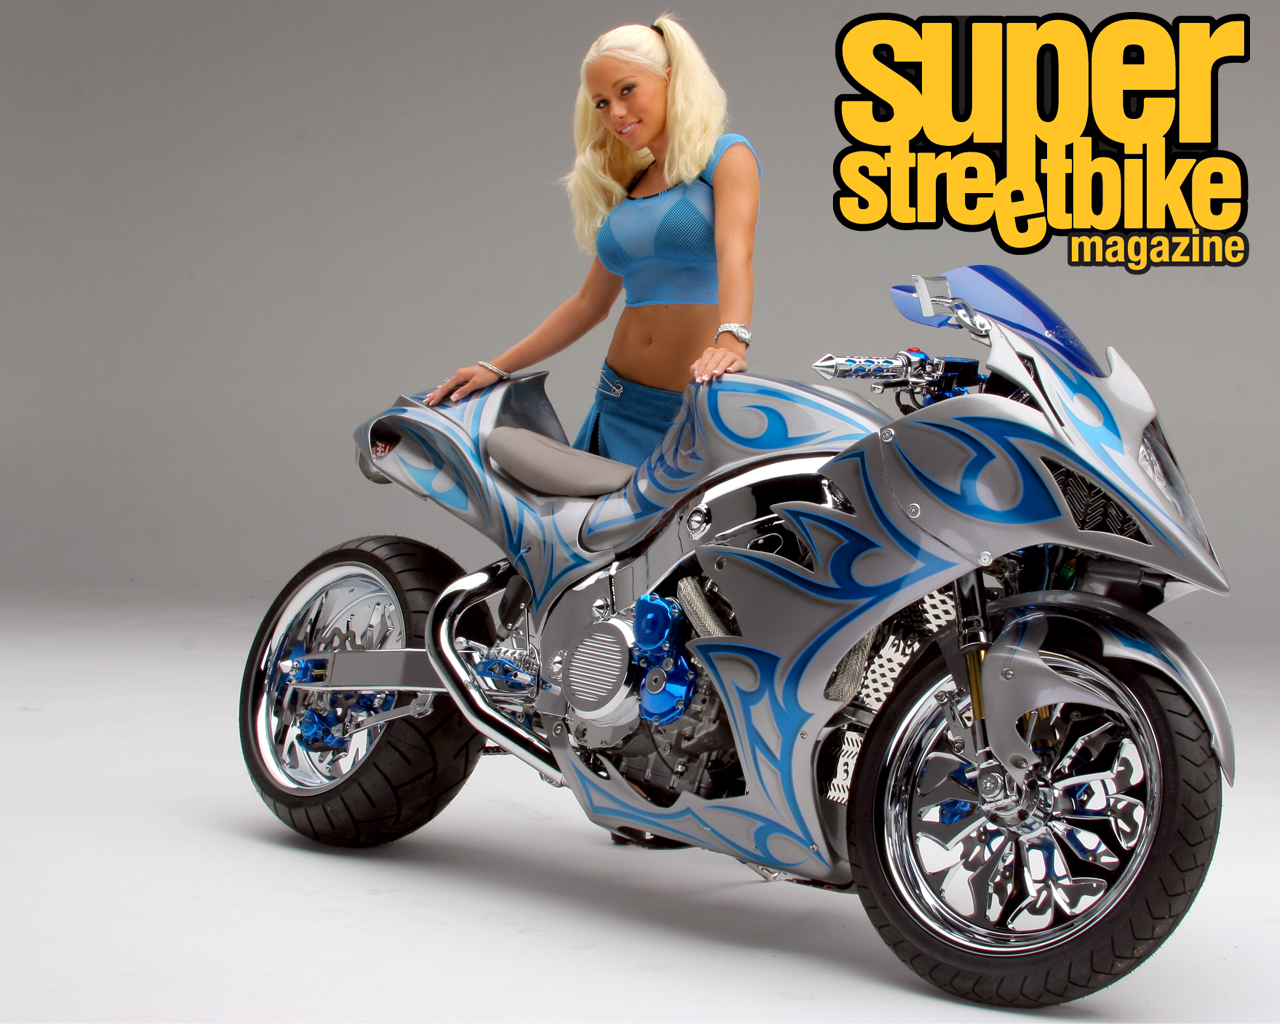 http://4.bp.blogspot.com/-g45w-6Qm0ro/UdspKHXYqDI/AAAAAAAACSA/nGPKrSK3Iyo/s1600/super_street_bike_wallpaper.jpg Cool